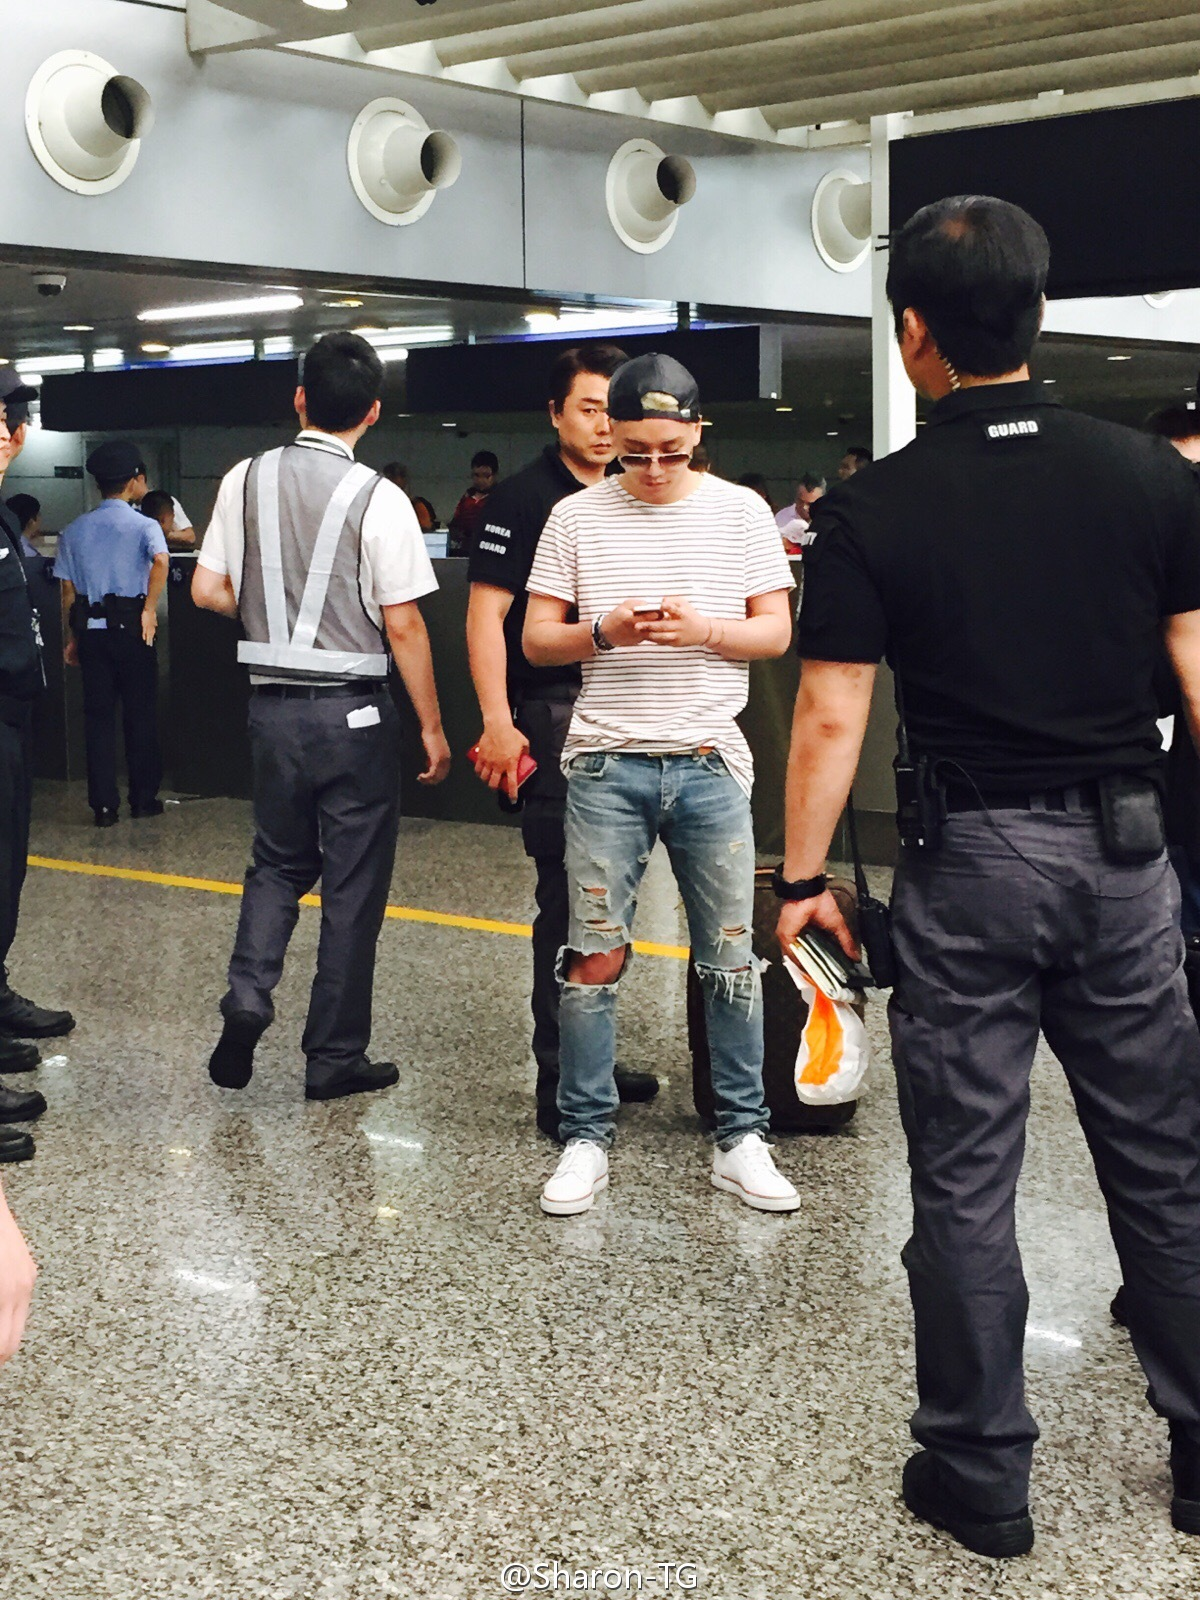 Guangzhou arrival by Sharon-TG 02.jpg